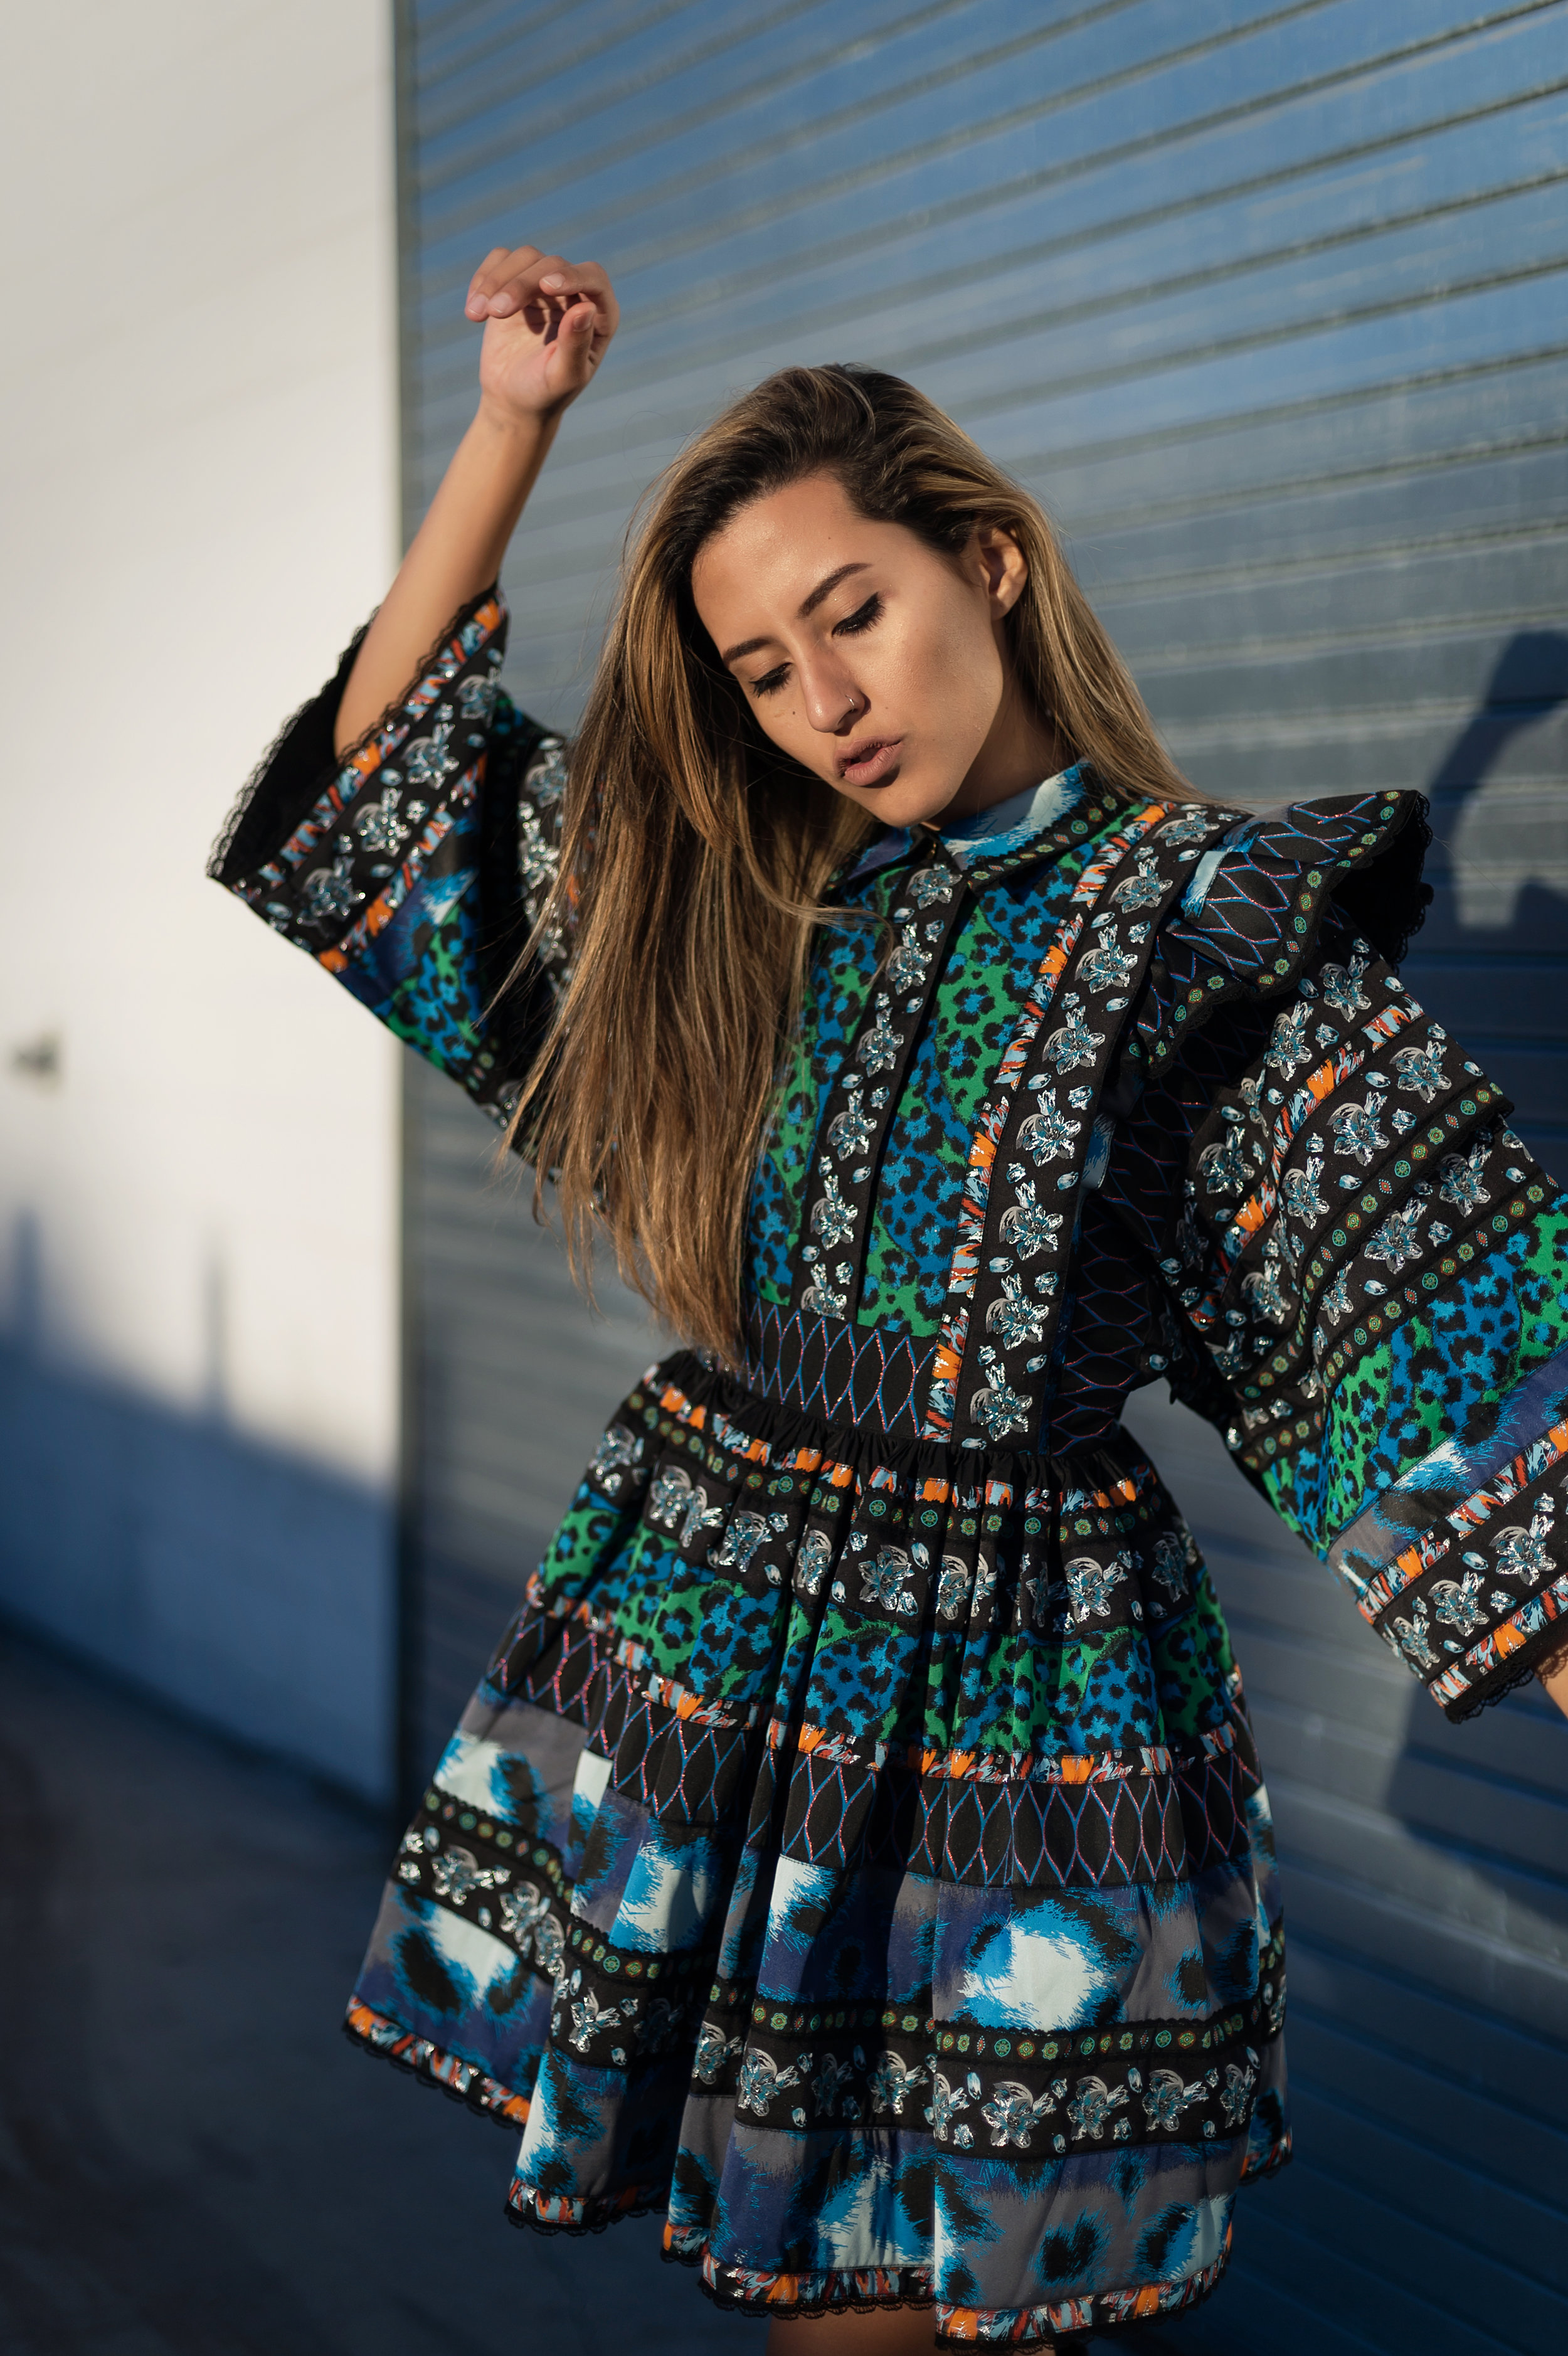 fashion_blogger_raquel_paiva_wears_kenzo_hm_designer_collaboration